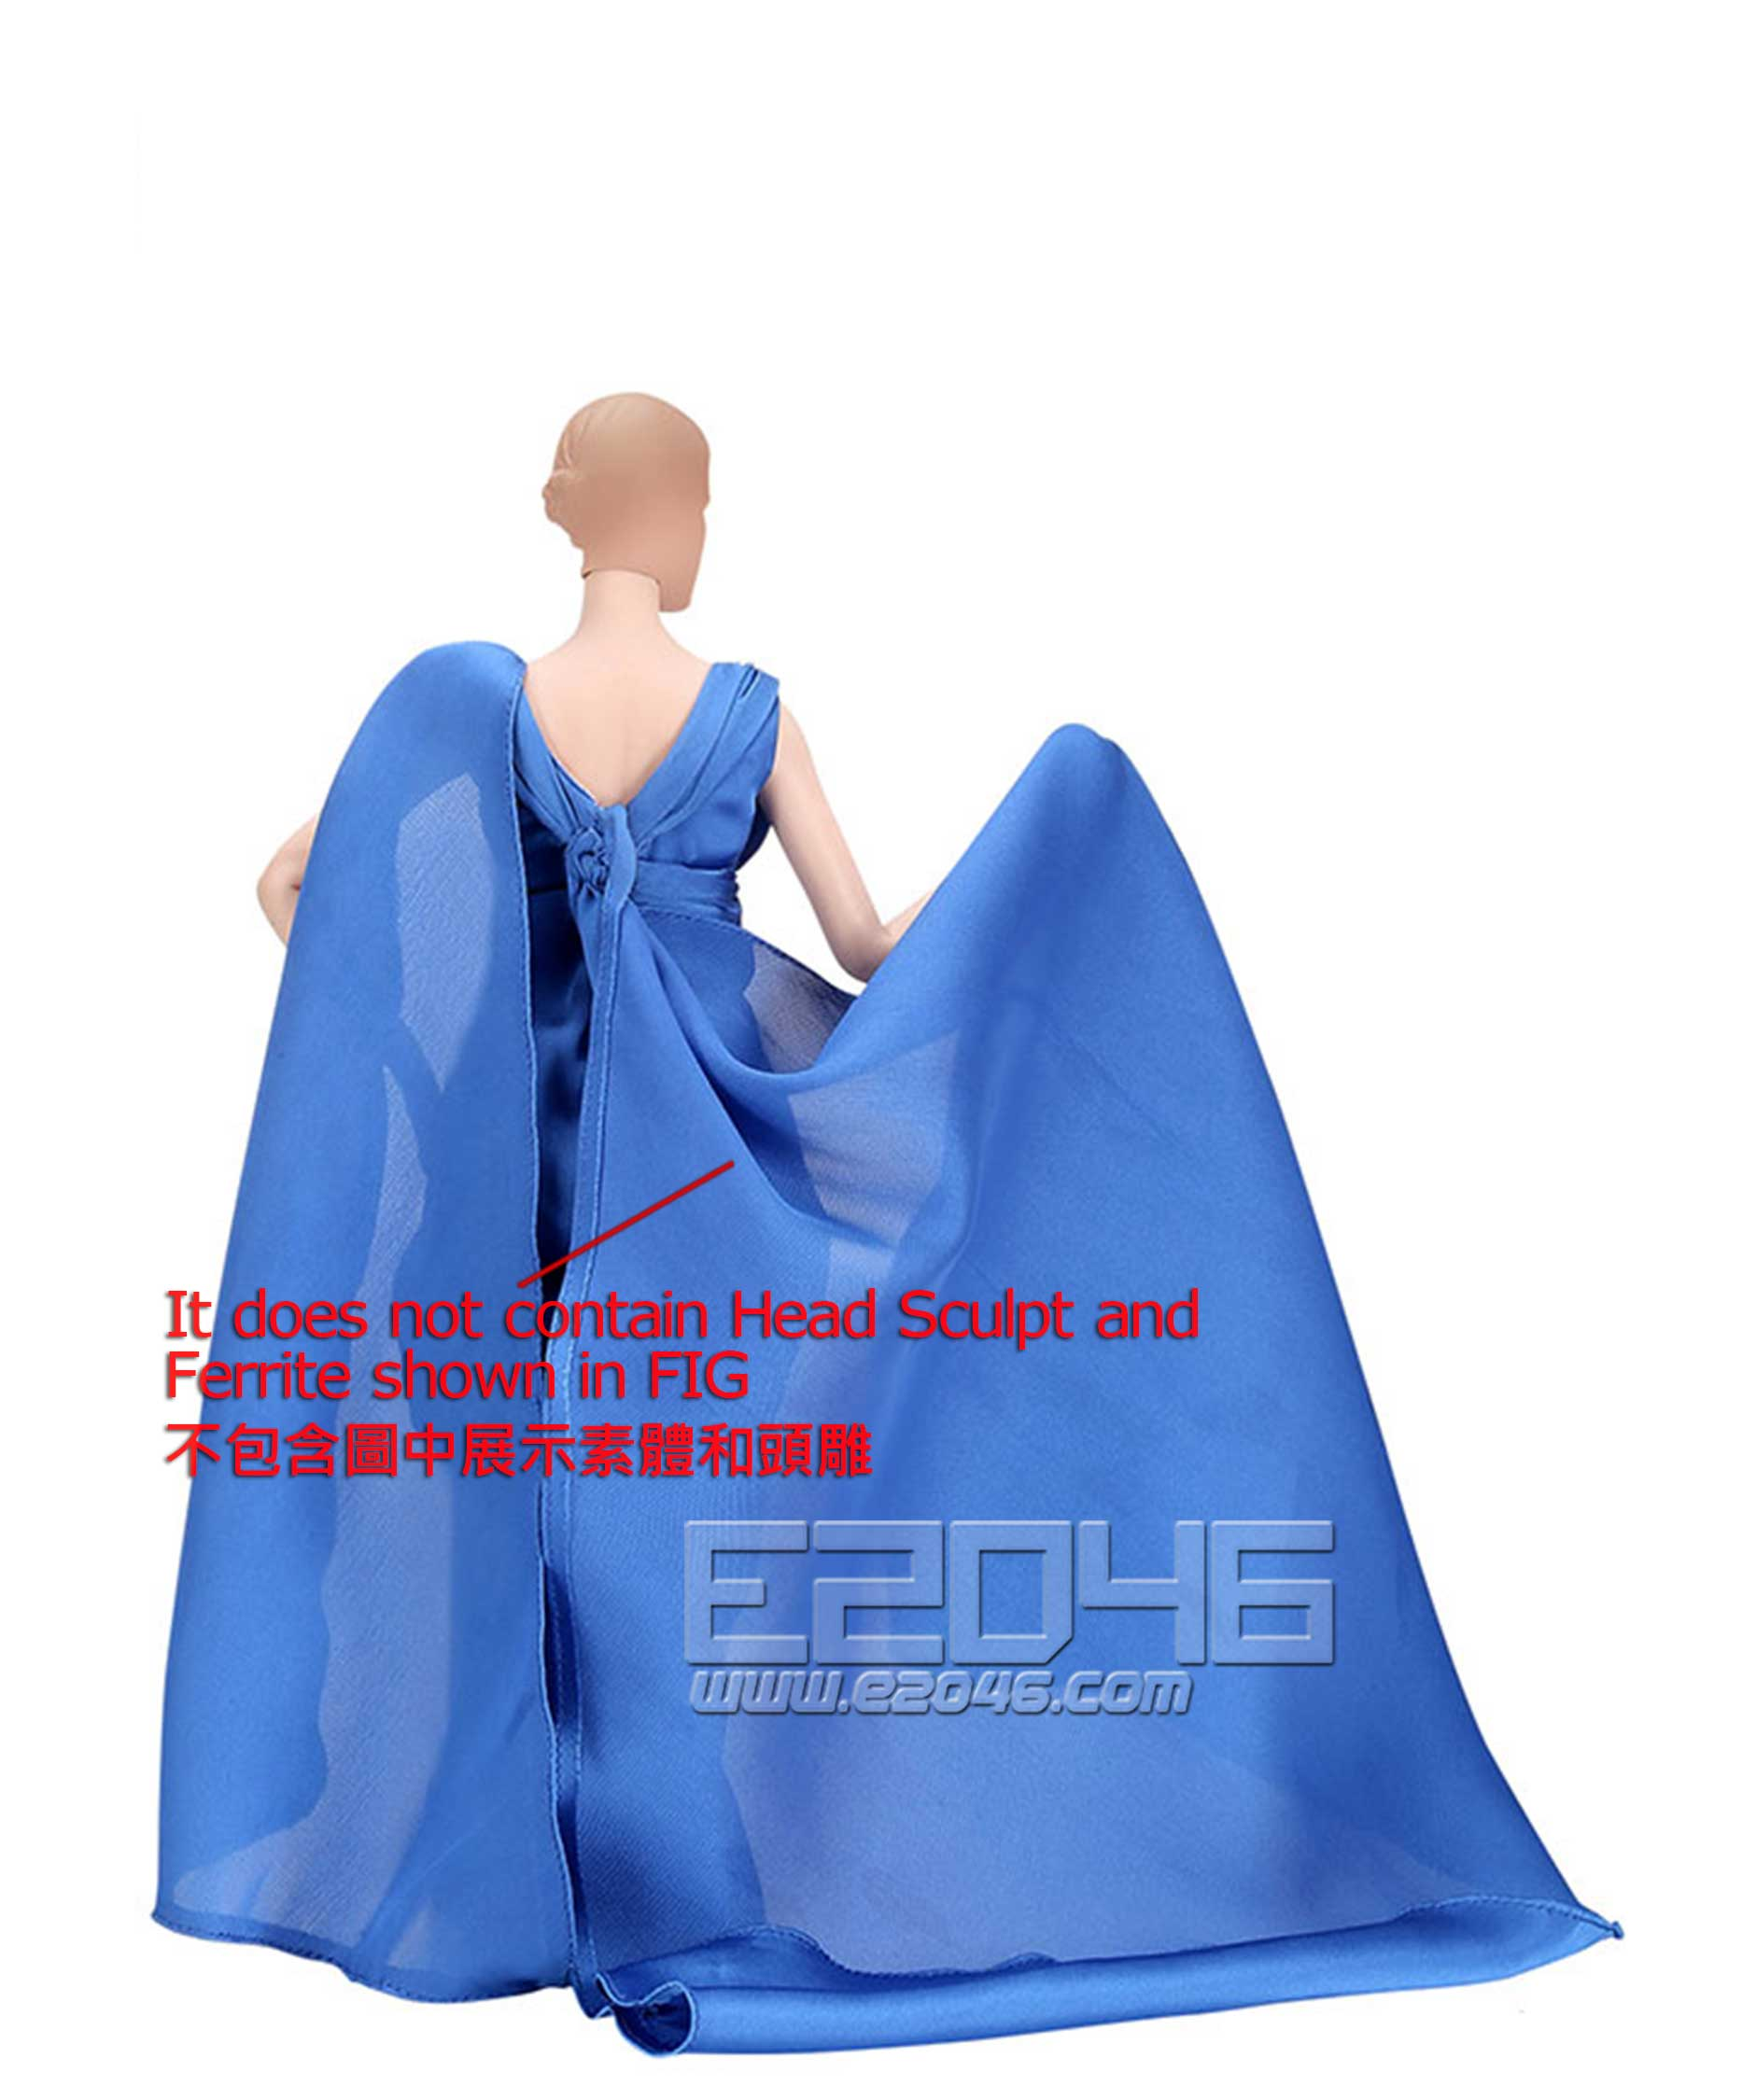 FULL EVENING DRESS A (DOLL)